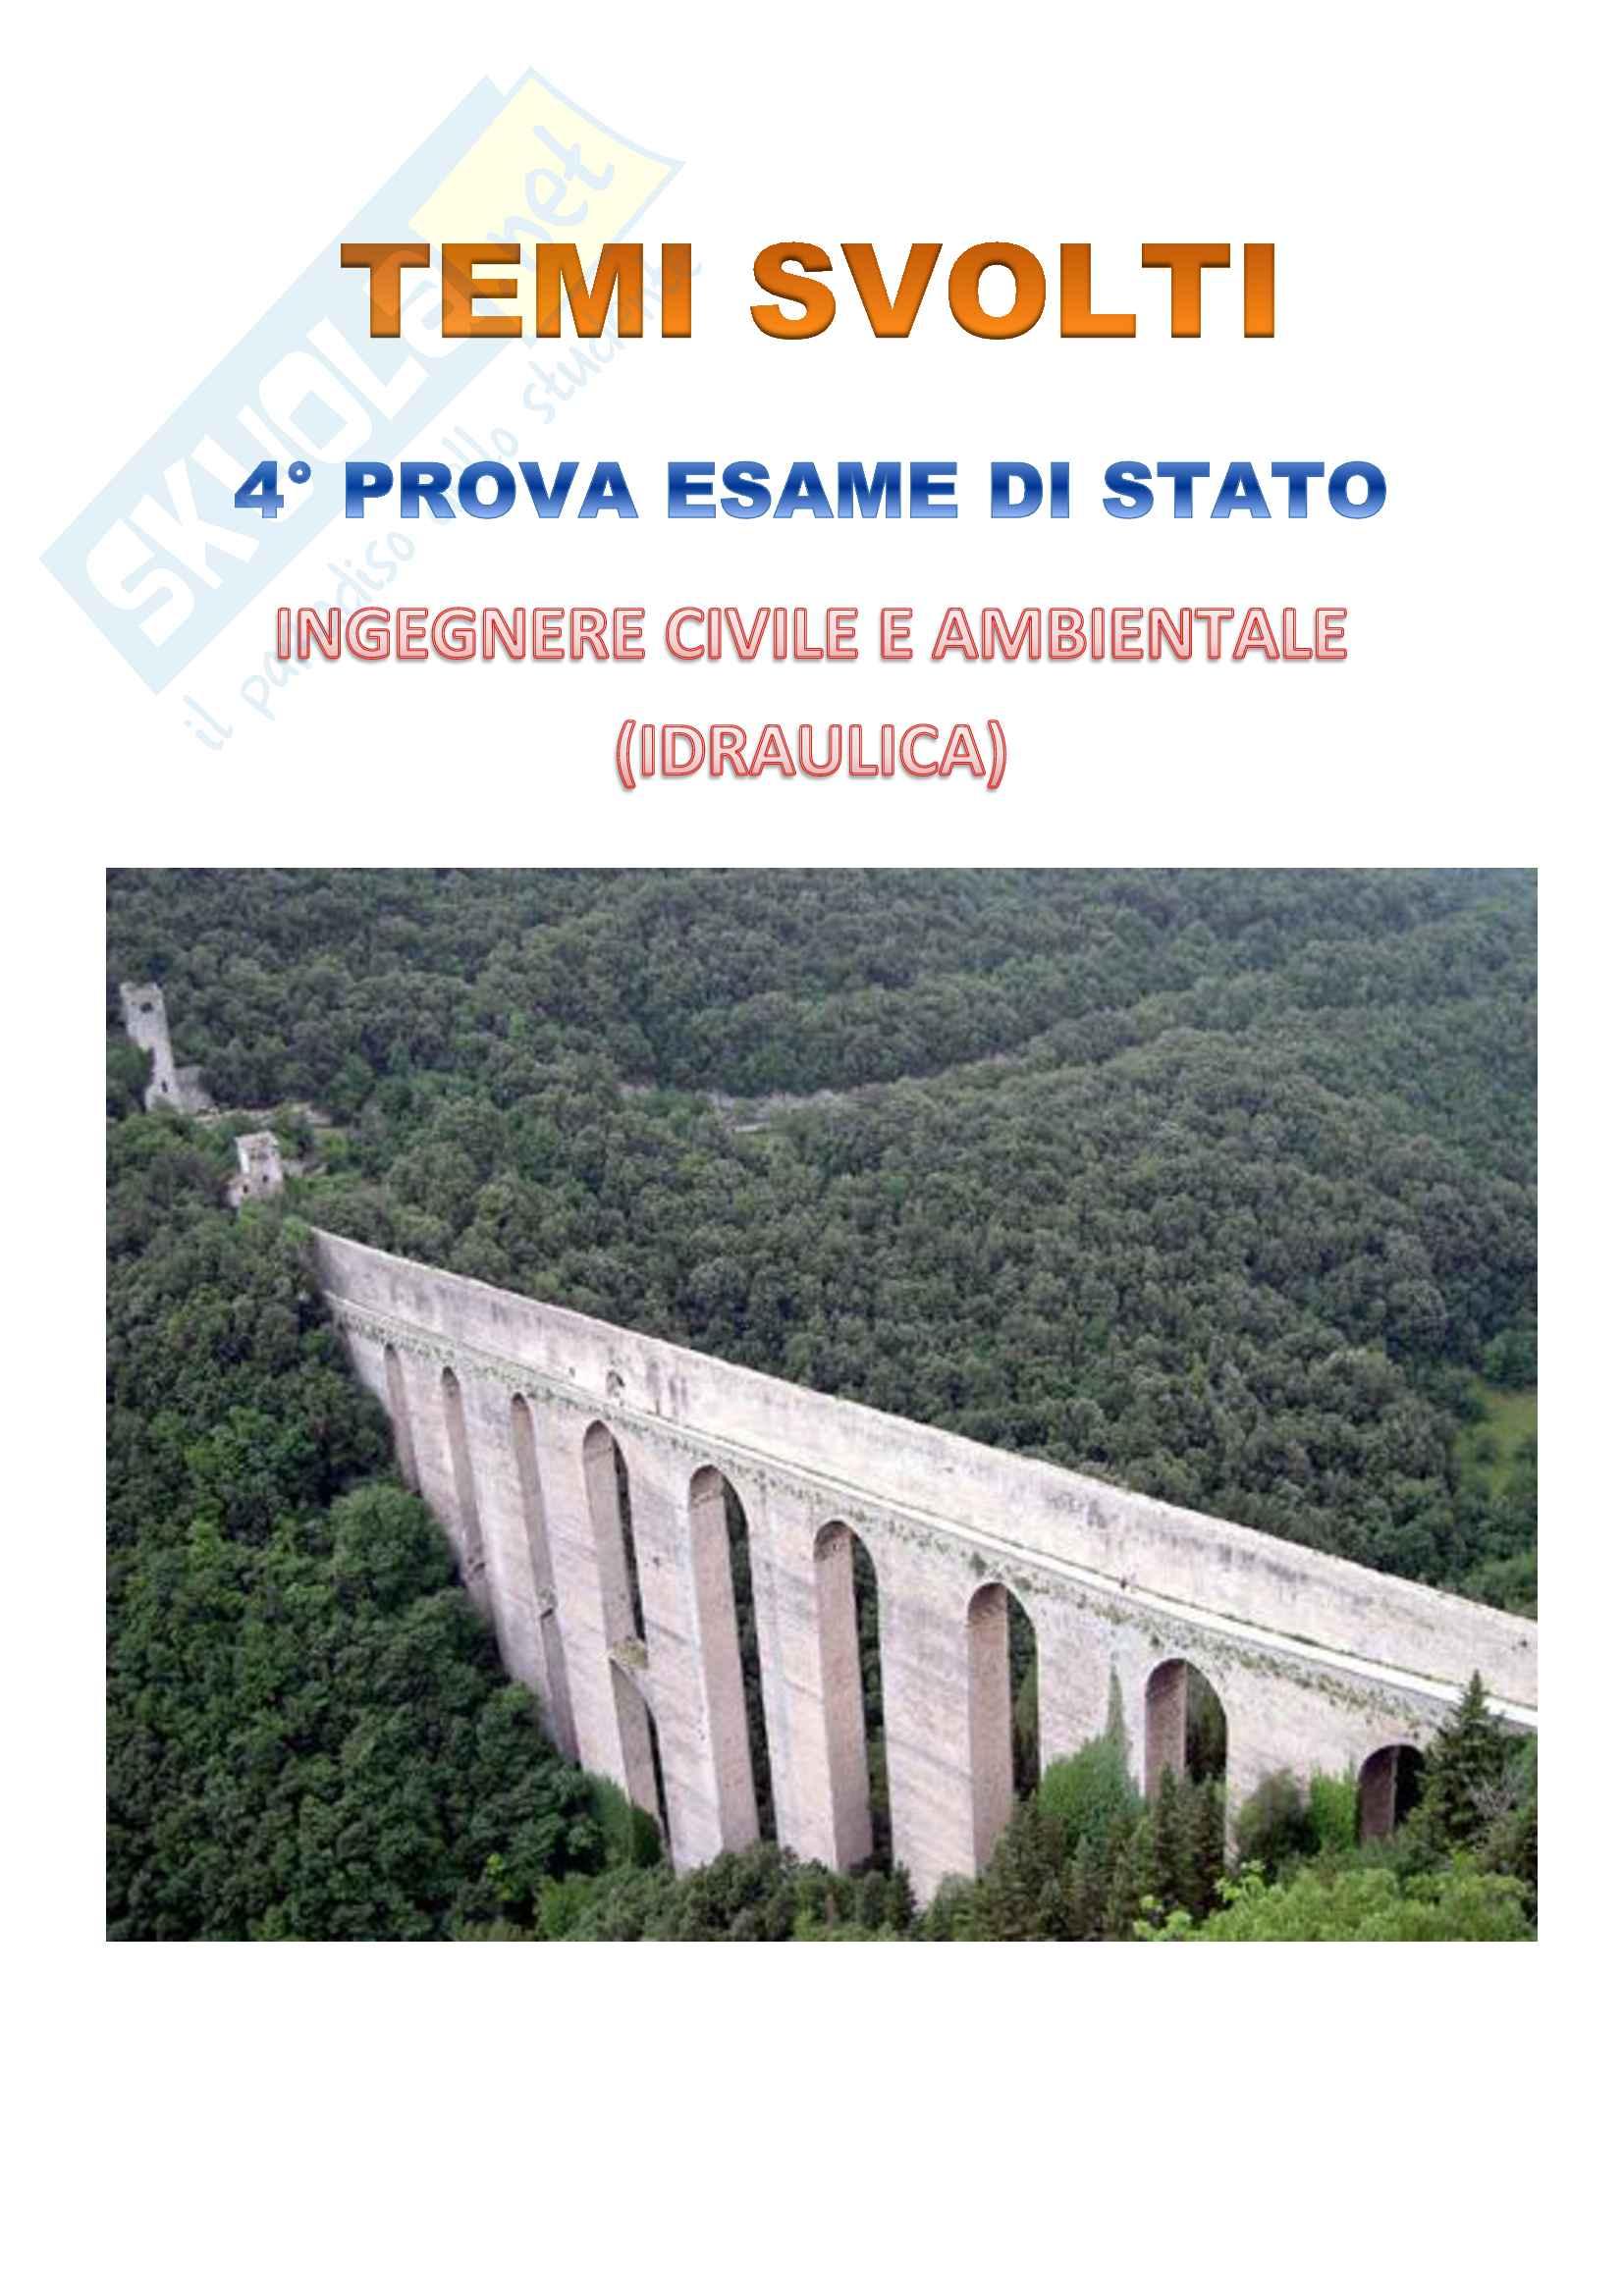 Esame di stato - IV prova idraulica